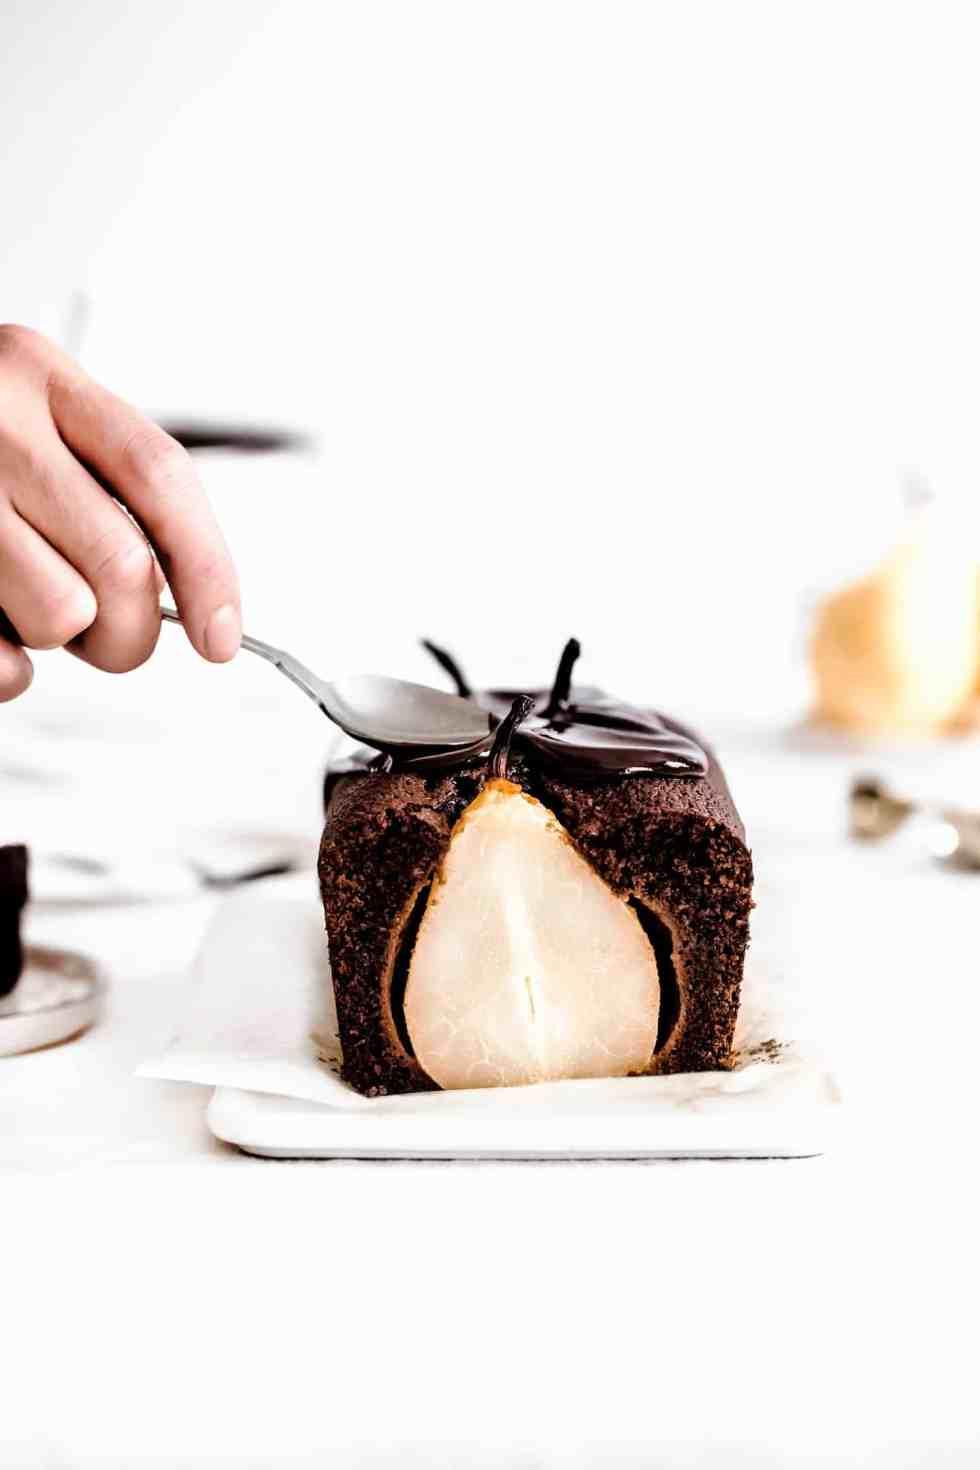 Pear chocolate dessert